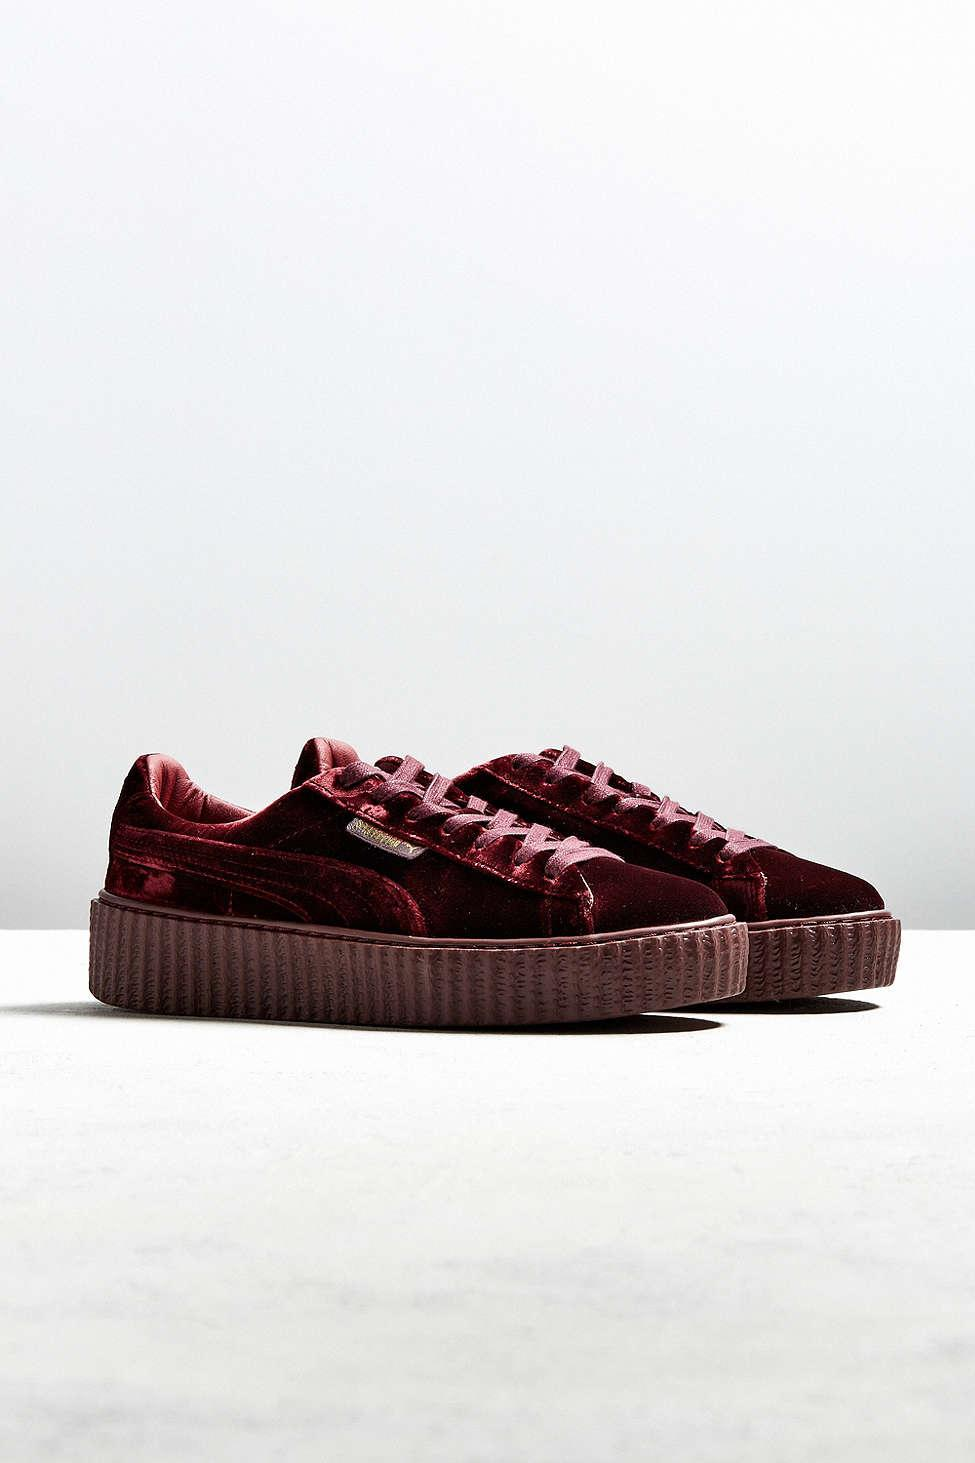 new arrival ace48 78561 PUMA Red Fenty By Rihanna Women's Velvet Creeper Sneaker